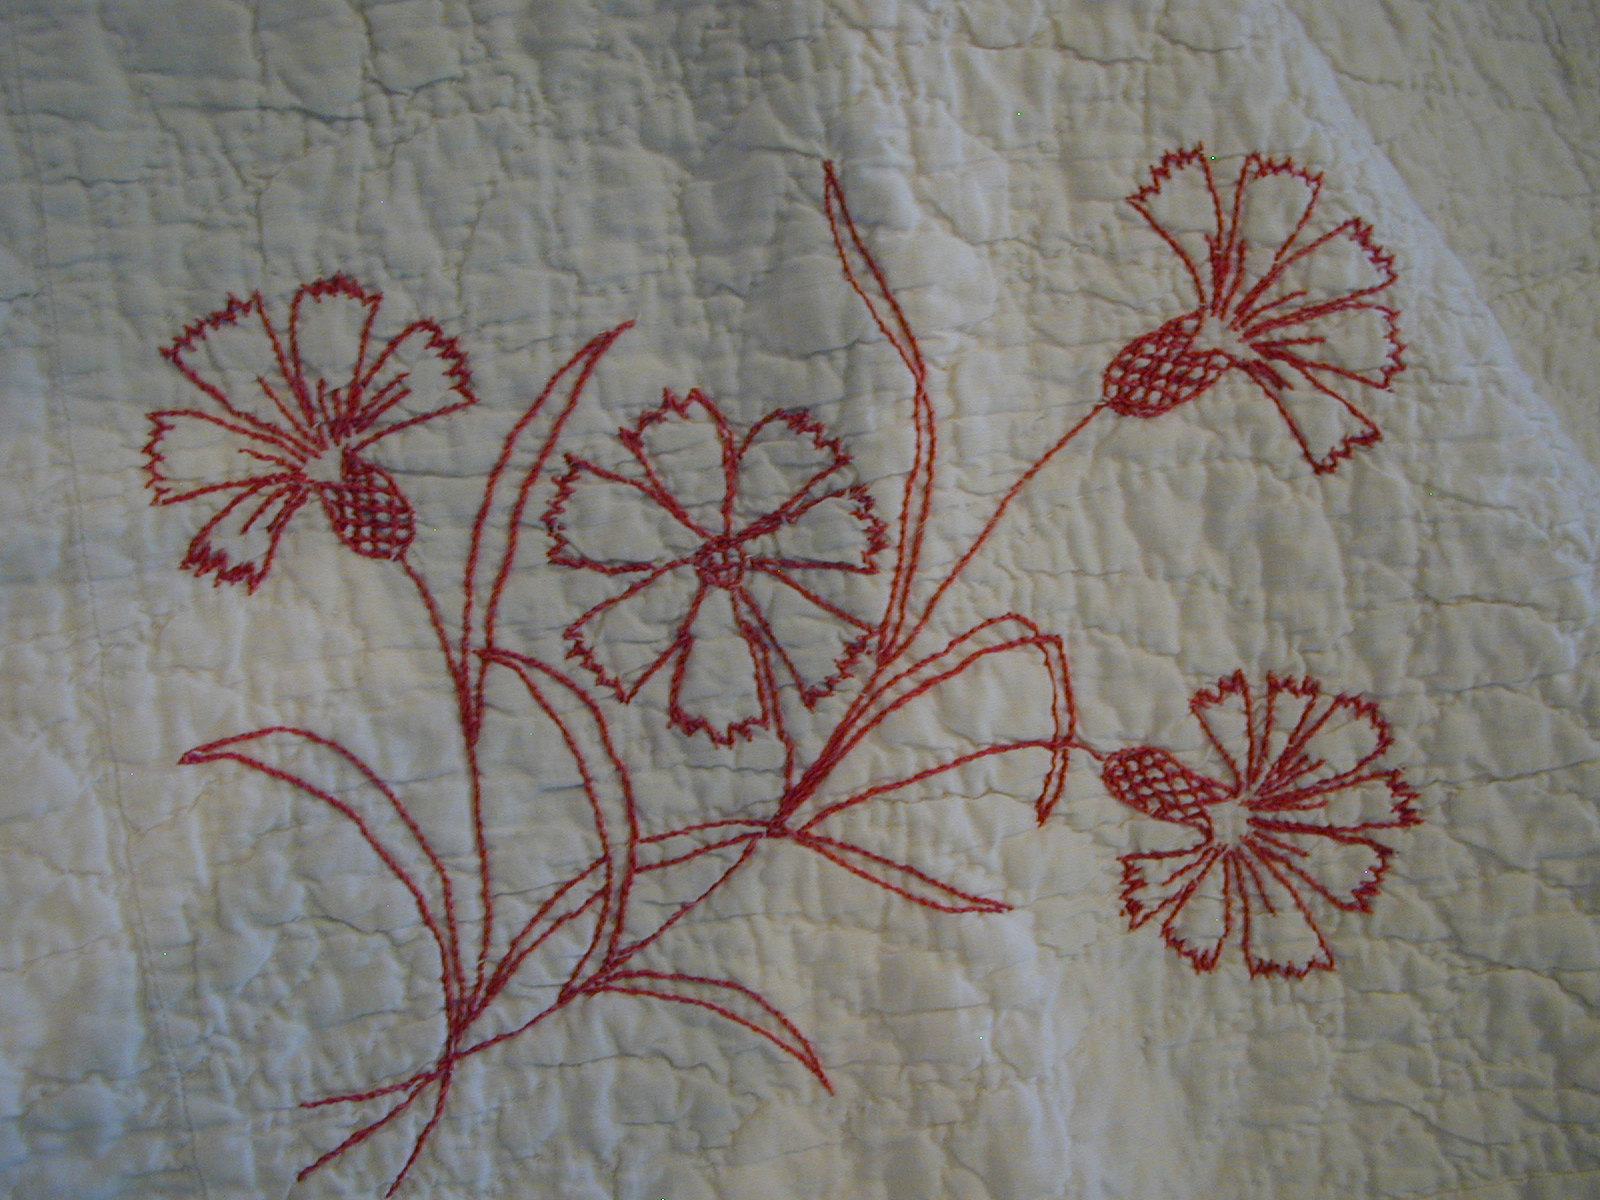 Redwork Quilting Patterns : Moonbear Longarm Quilting: Antique Redwork Quilt